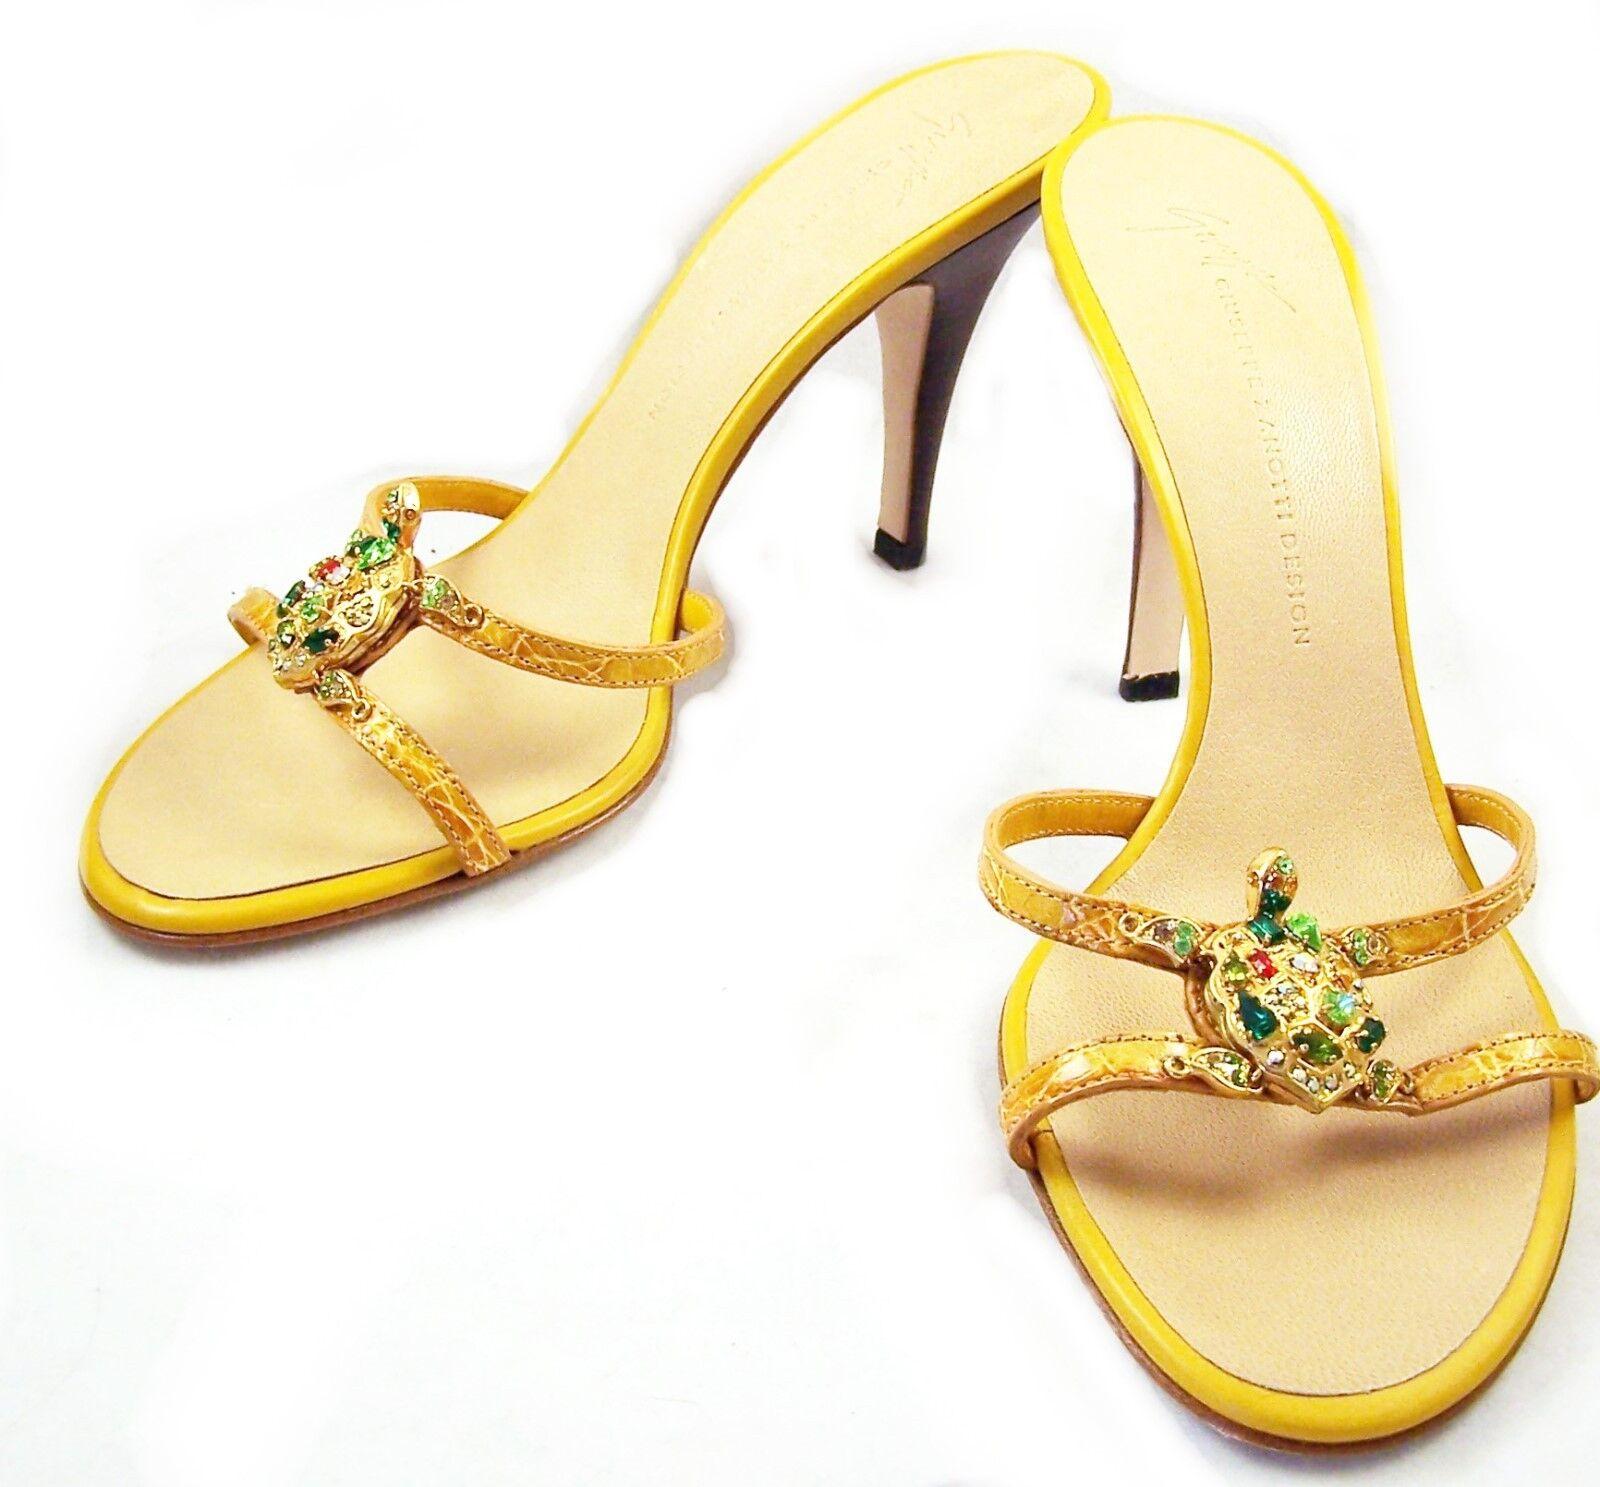 GI EPPE ZANOTTI Gold Stuvachoun Turtle Sandal Sz 39 1/2 - 9-9 1/2  500+ NIB